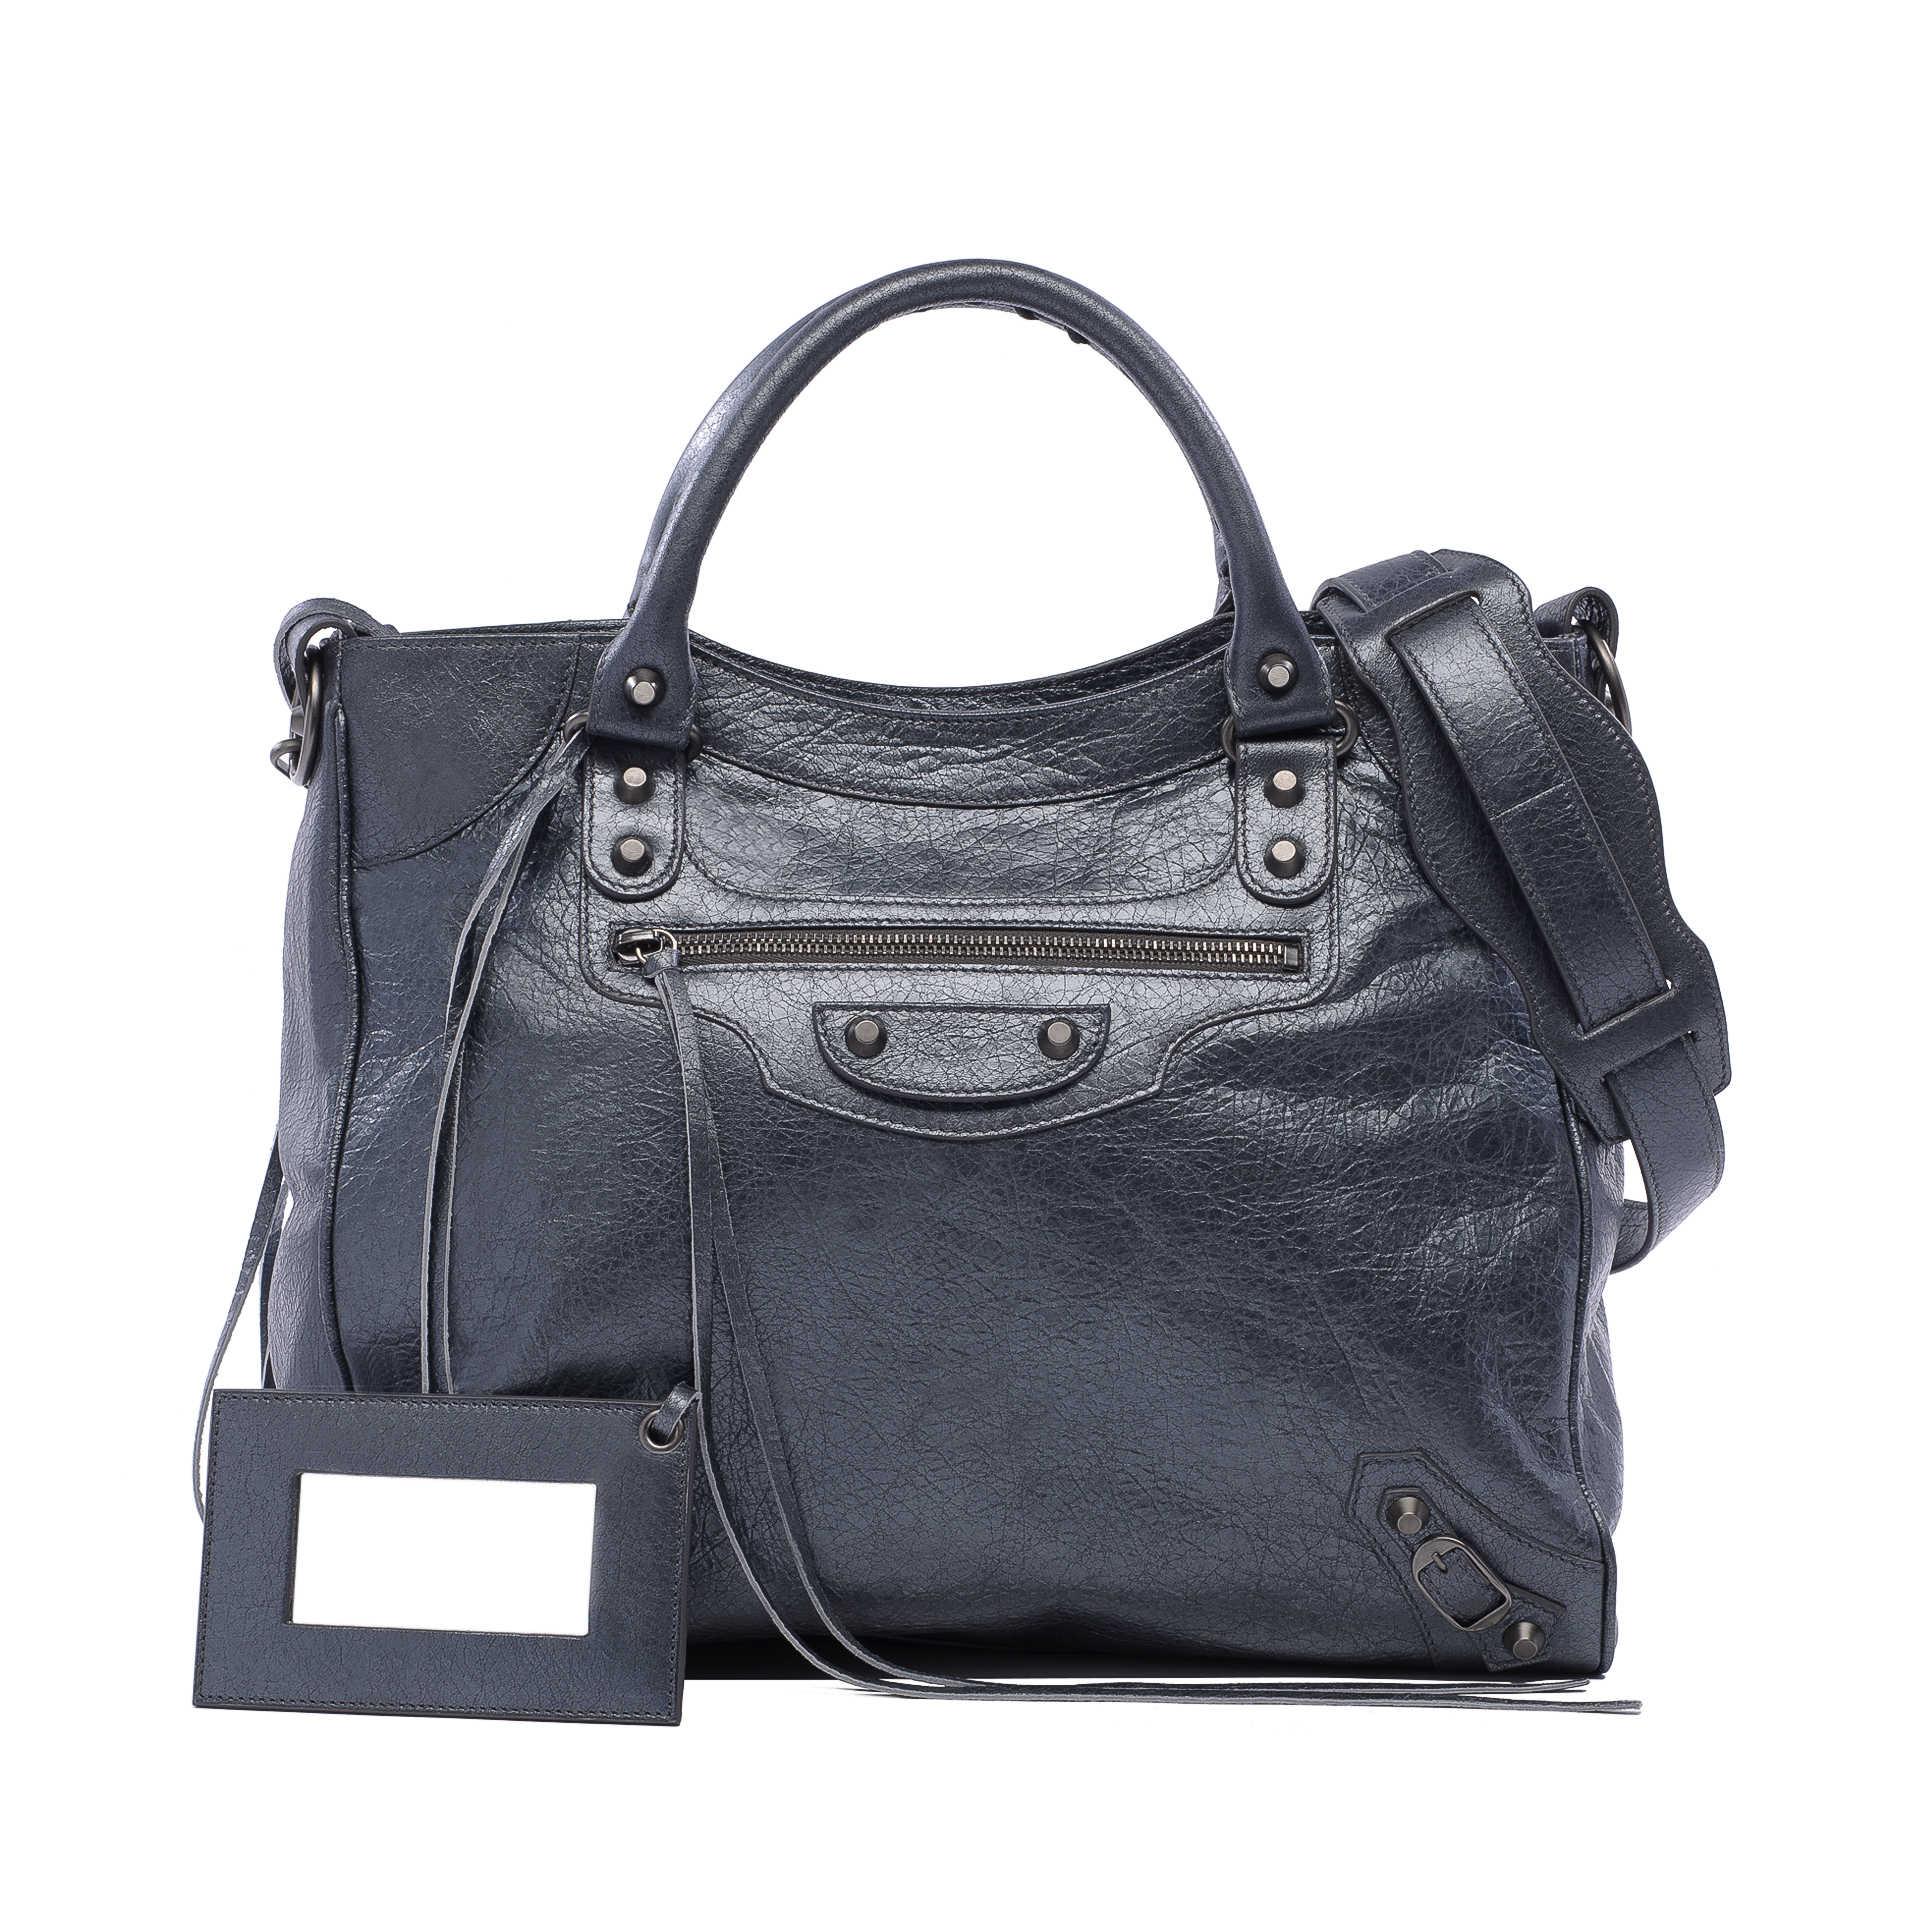 Balenciaga Velo Bag Spotted Fashion